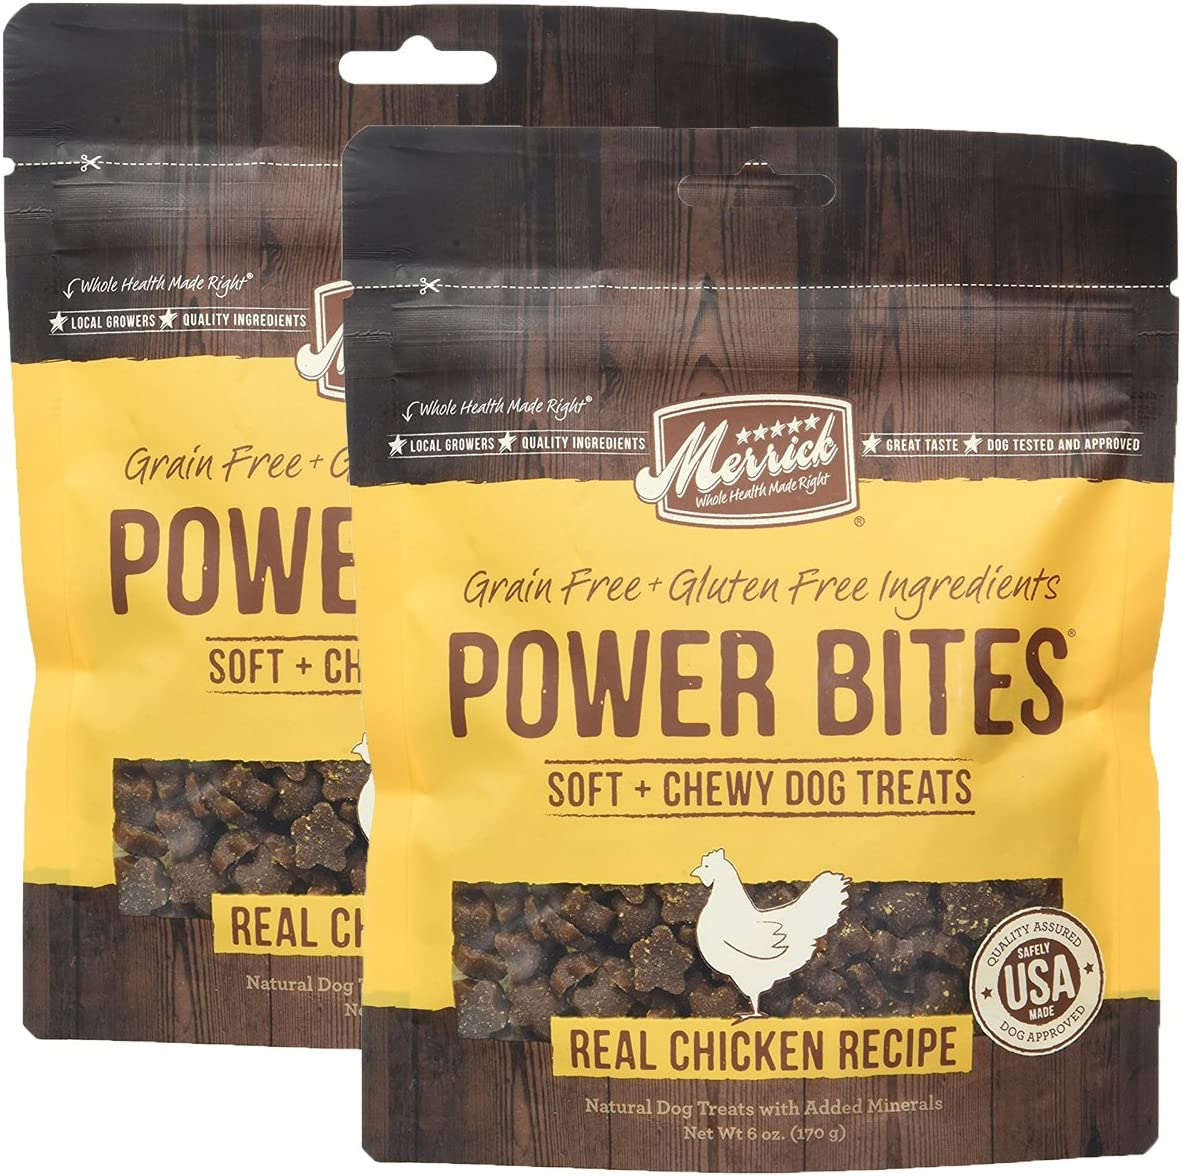 Merrick Grain Free Gluten Free Power Bites Dog Treats 6 oz